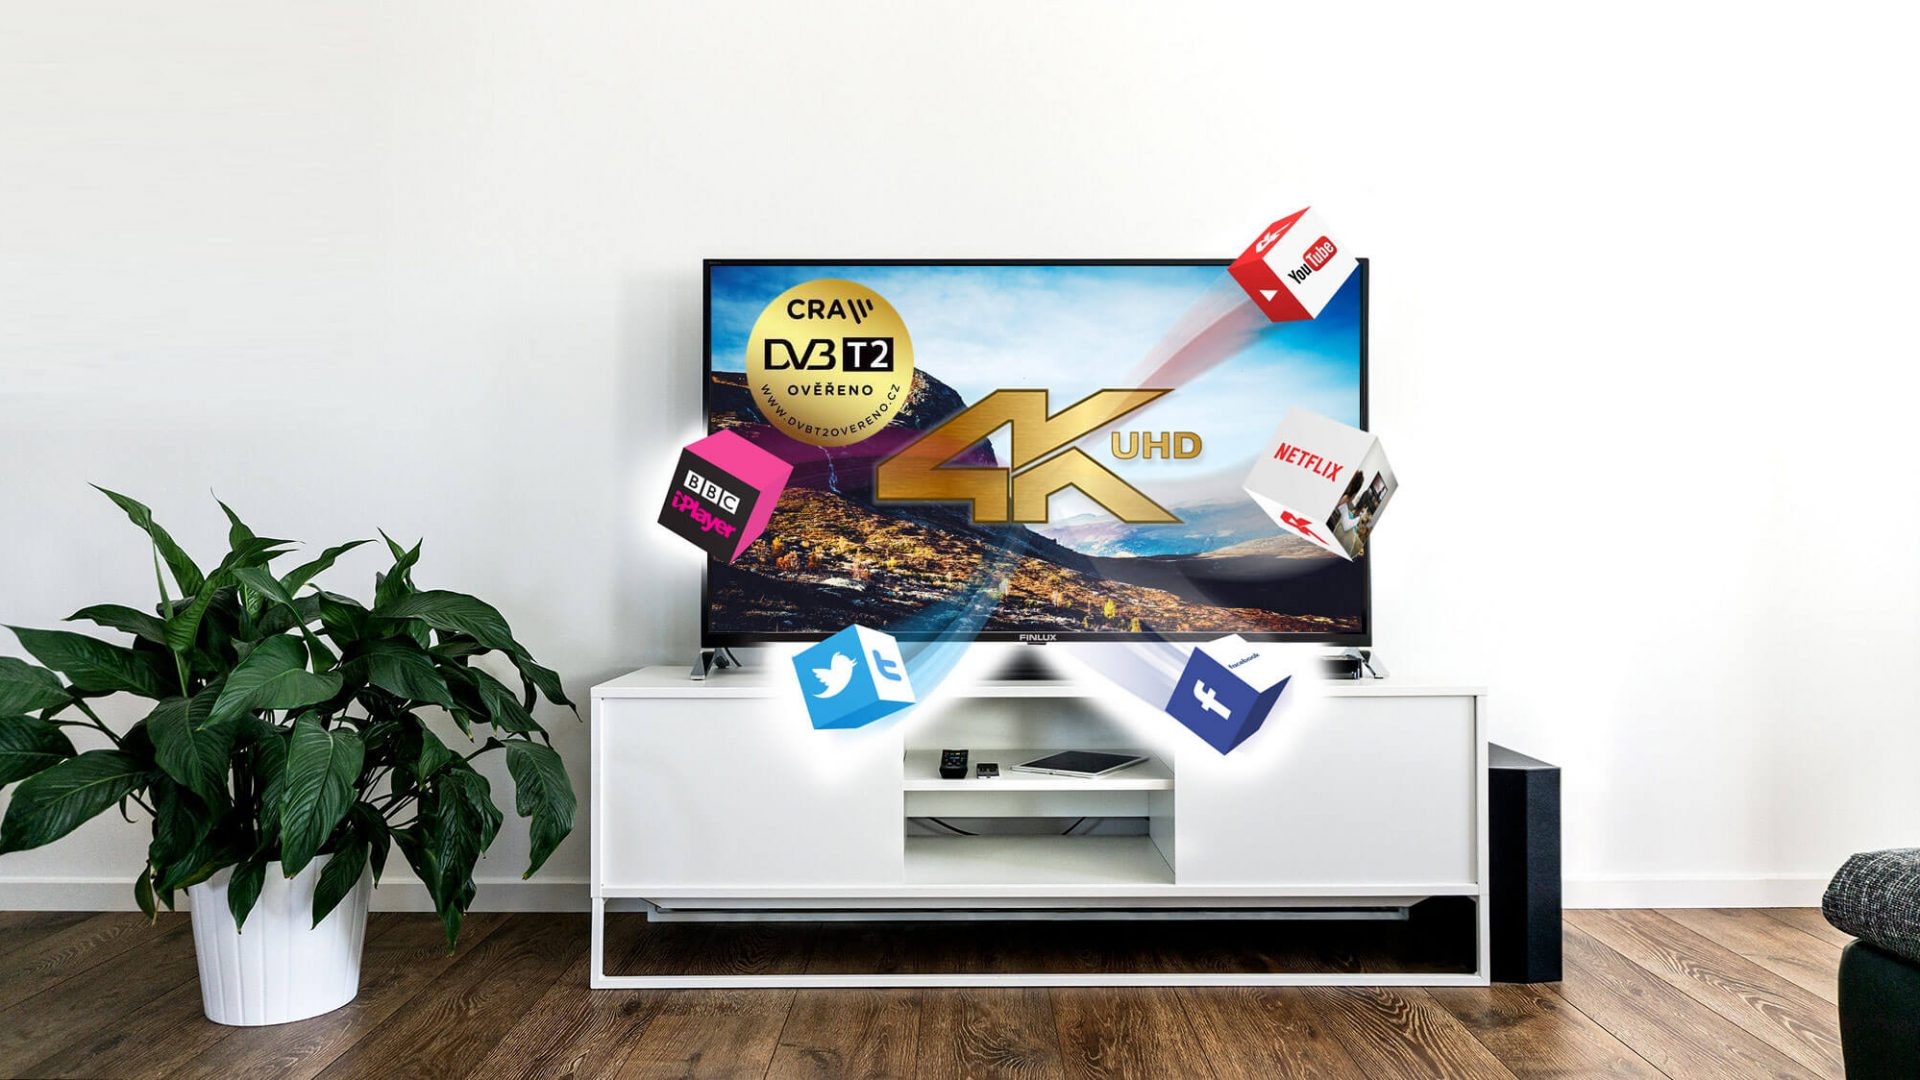 LED SMART TV 4K UHD DVB-T2 FINLUX